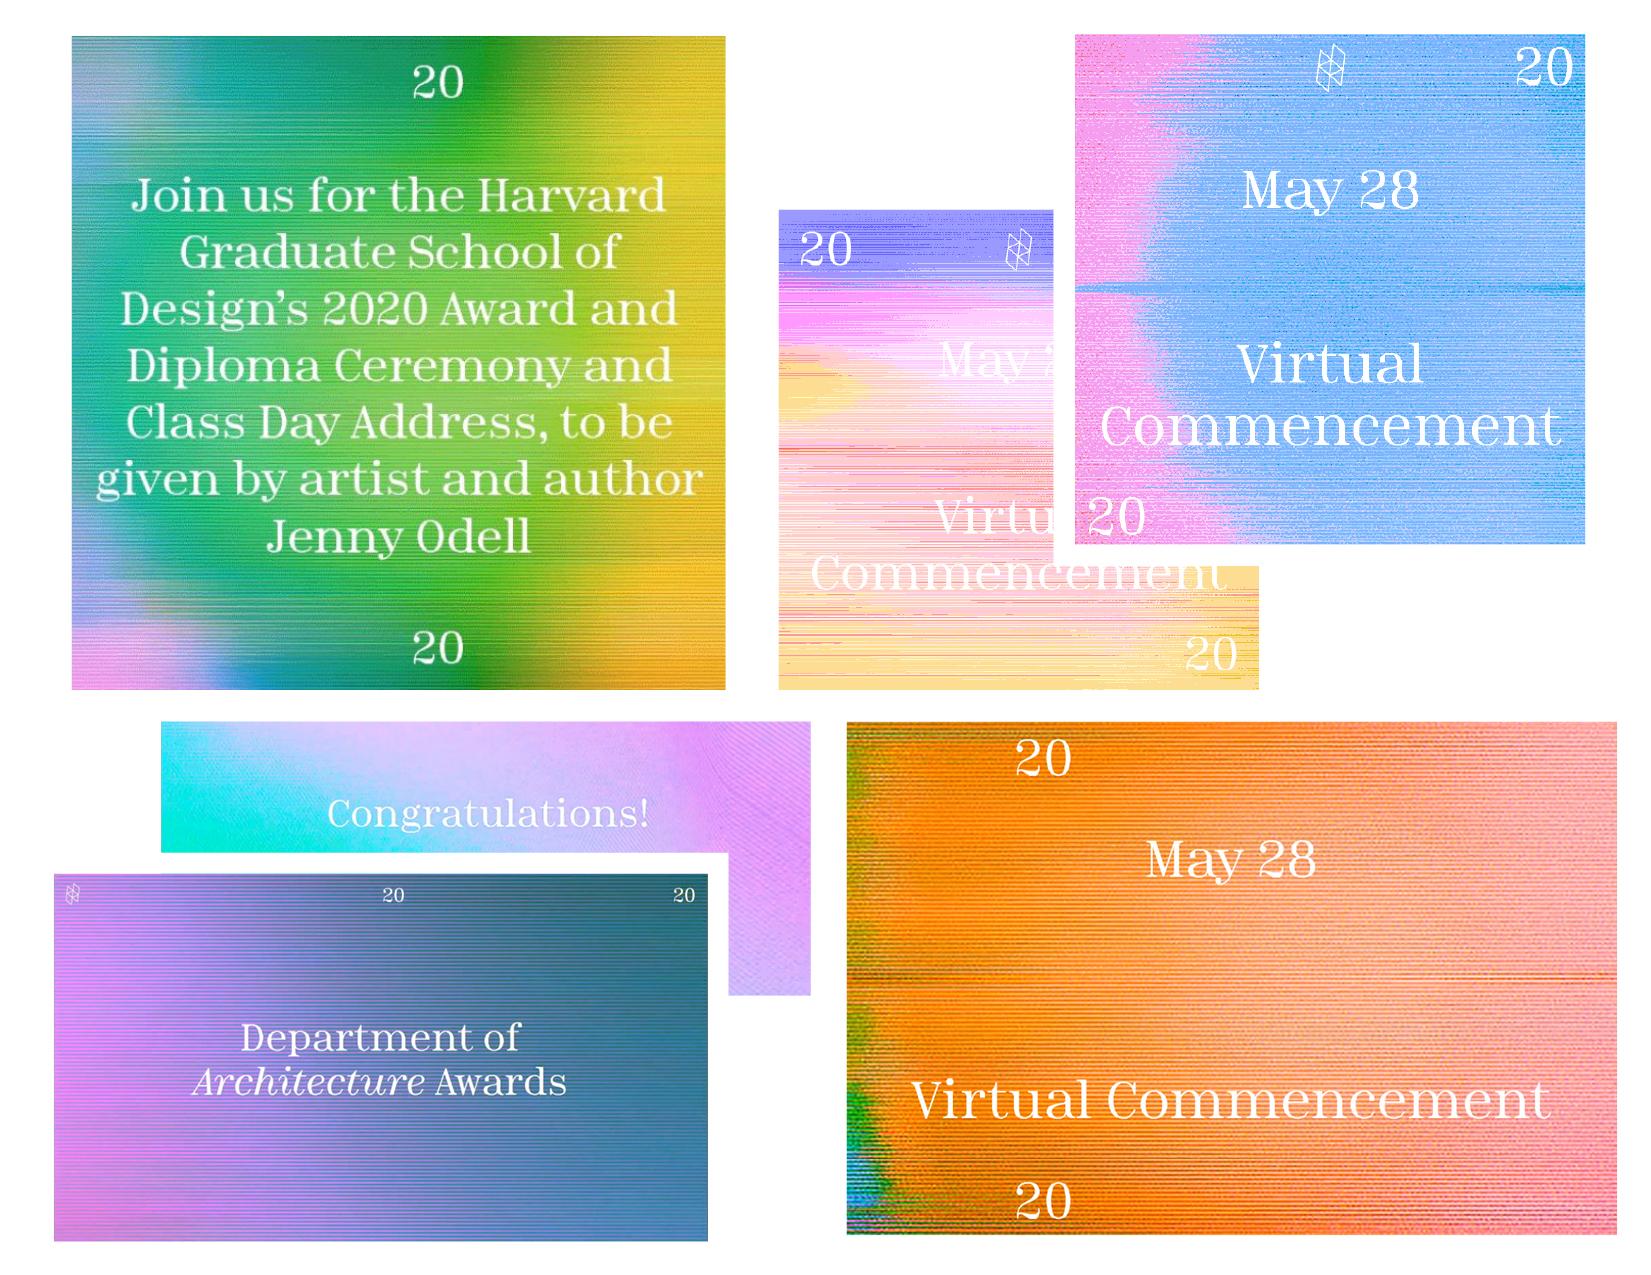 Harvard Graduate School of Design: Virtual Commencement